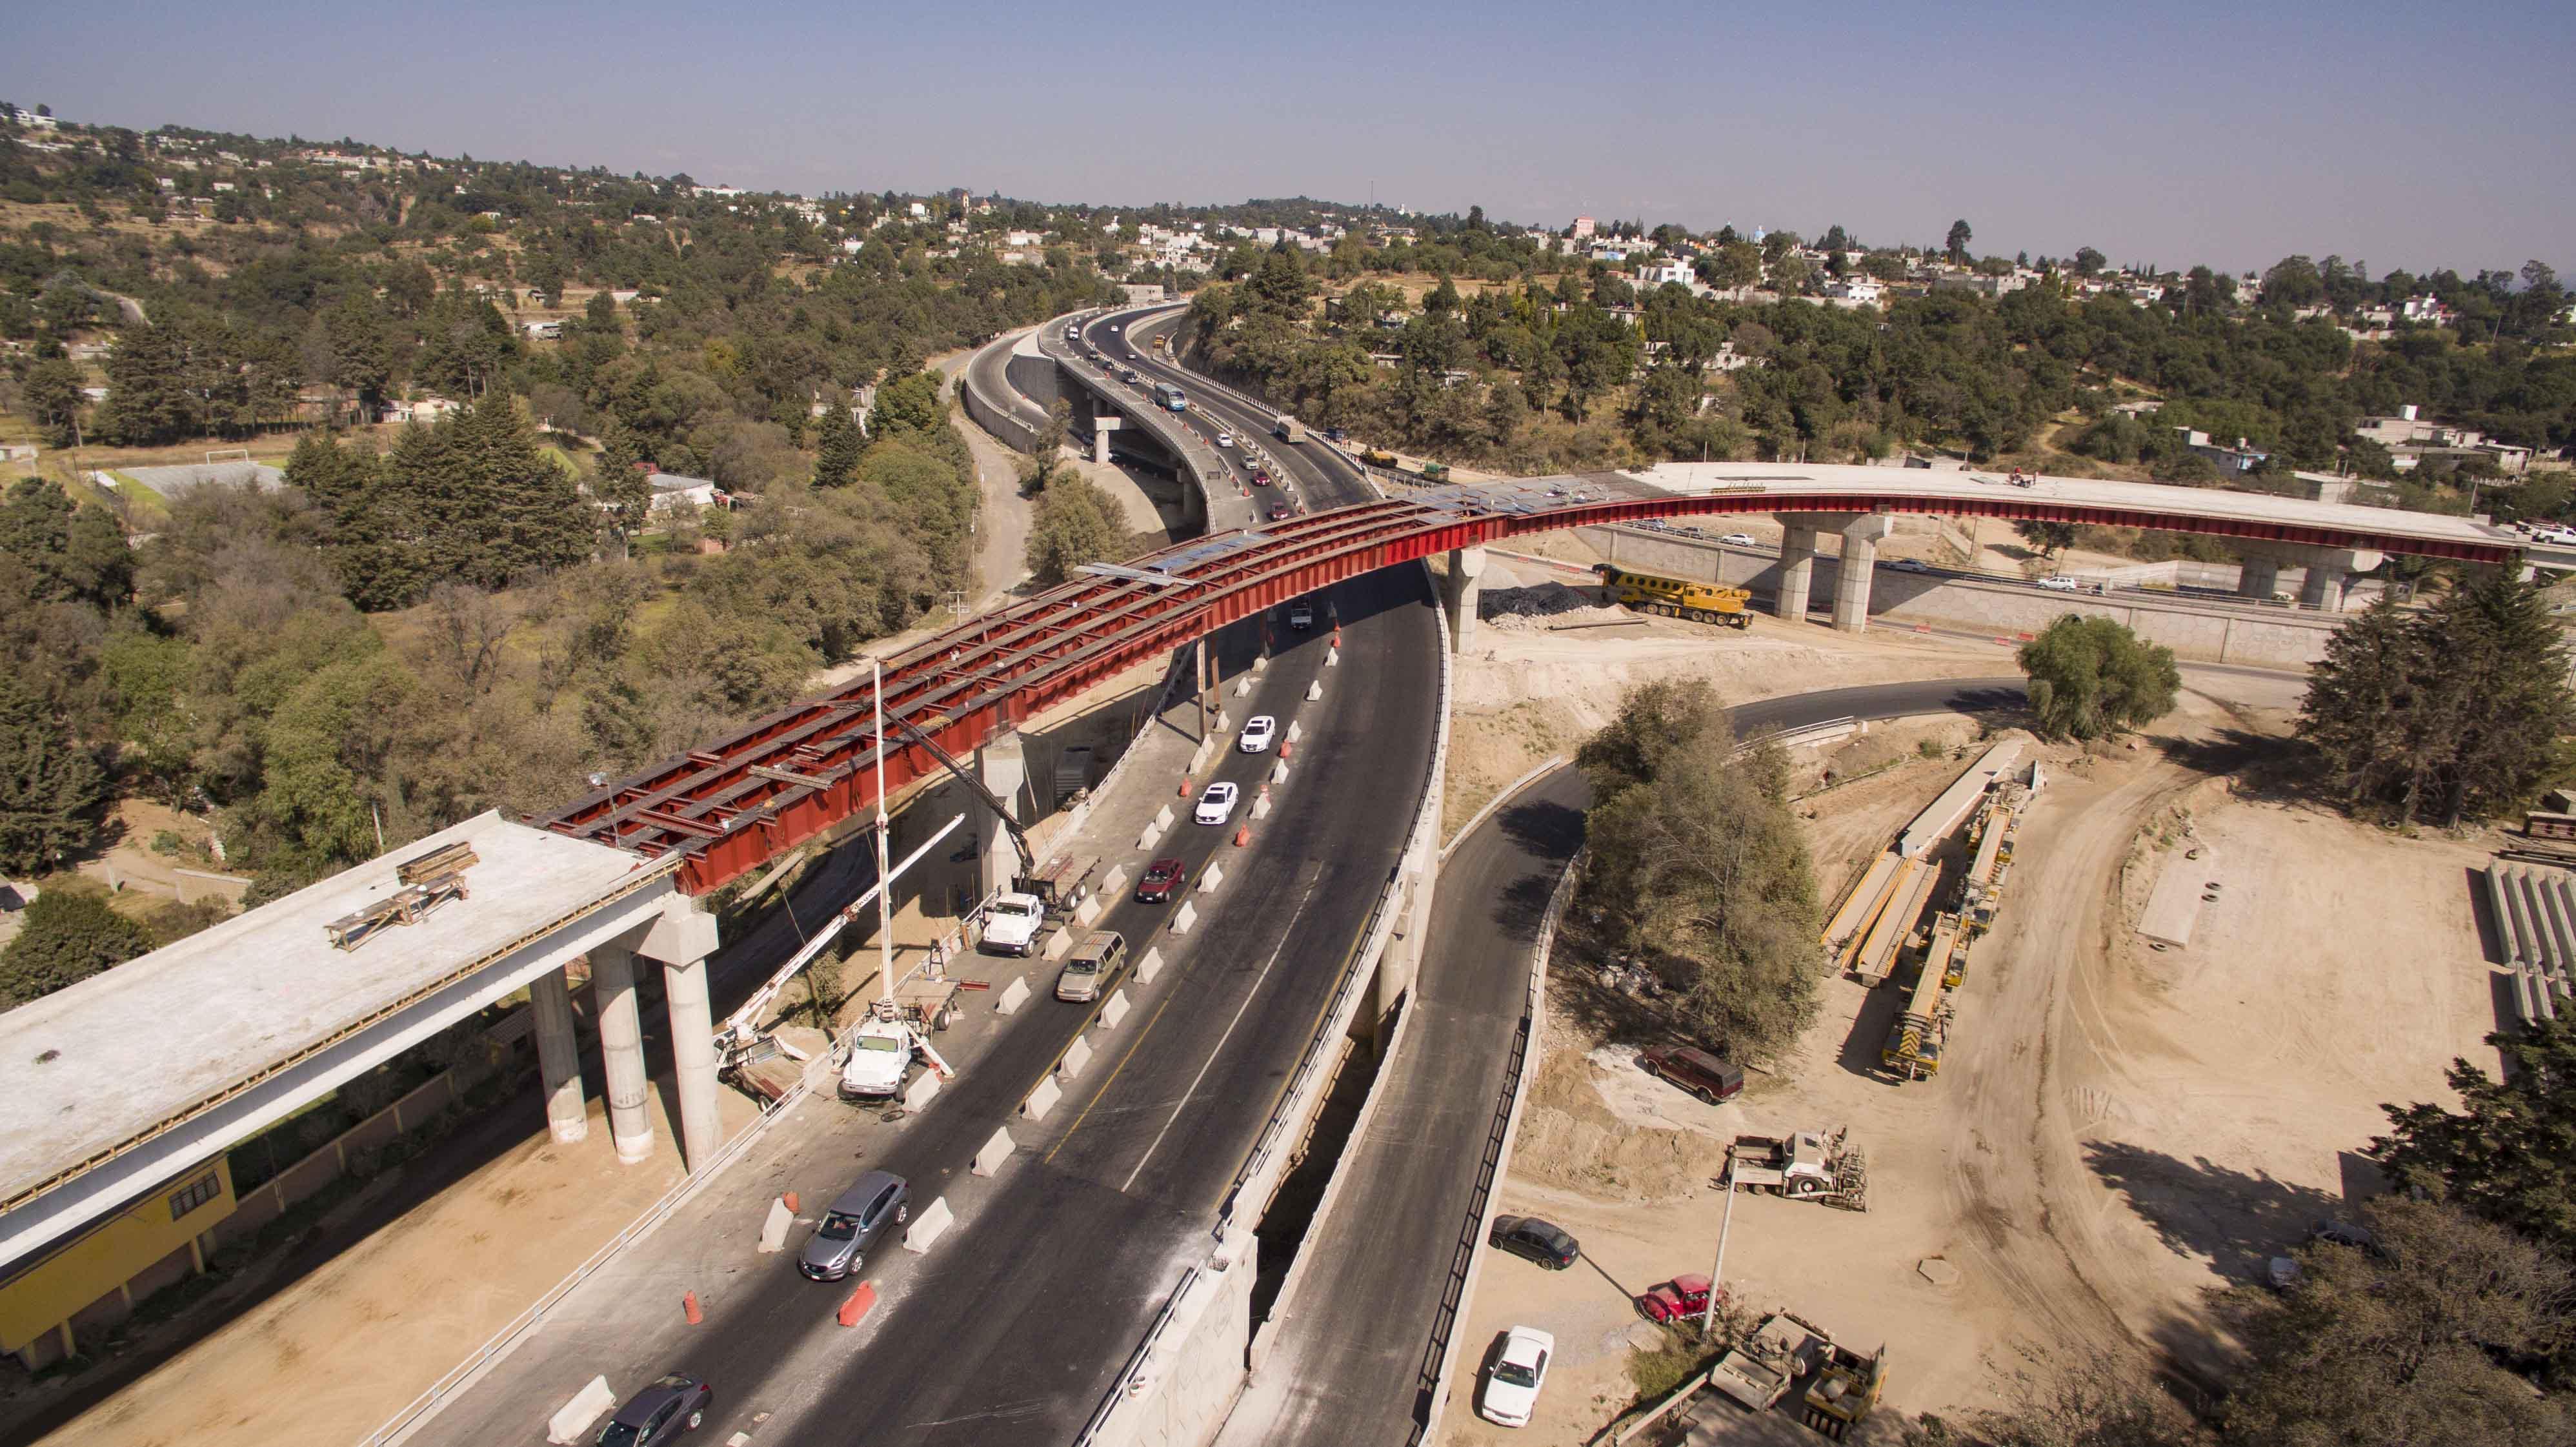 Anuncia Secoduvi cierre de carril en la carretera Tlaxcala-Apizaco